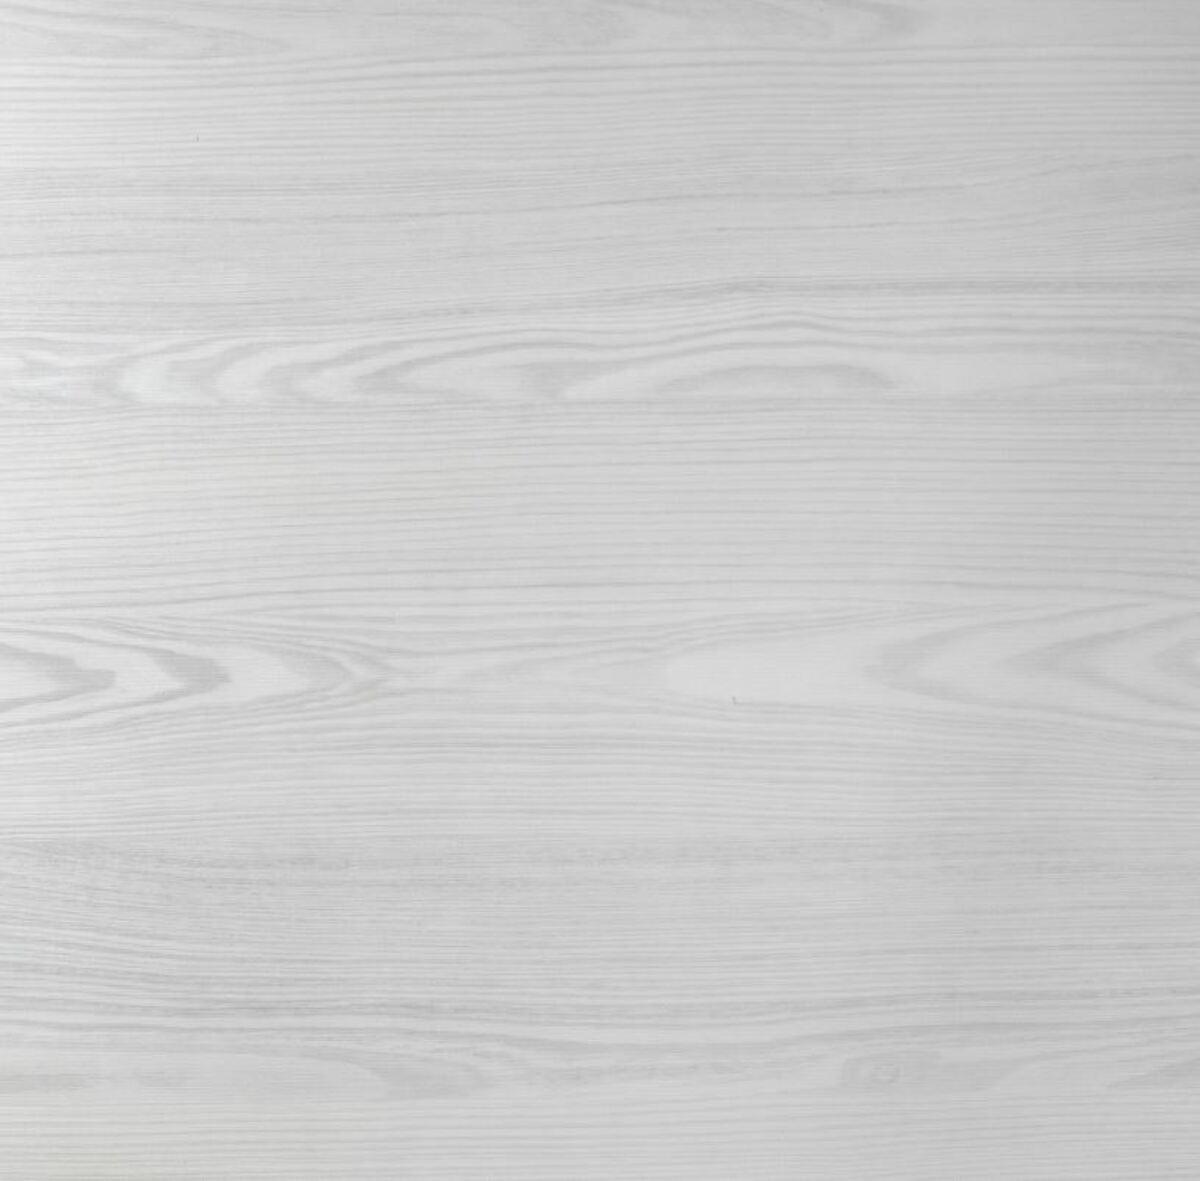 Kuchynská skrinka rohová horná Naturel Gia 60 cm borovica biela WC606072BB